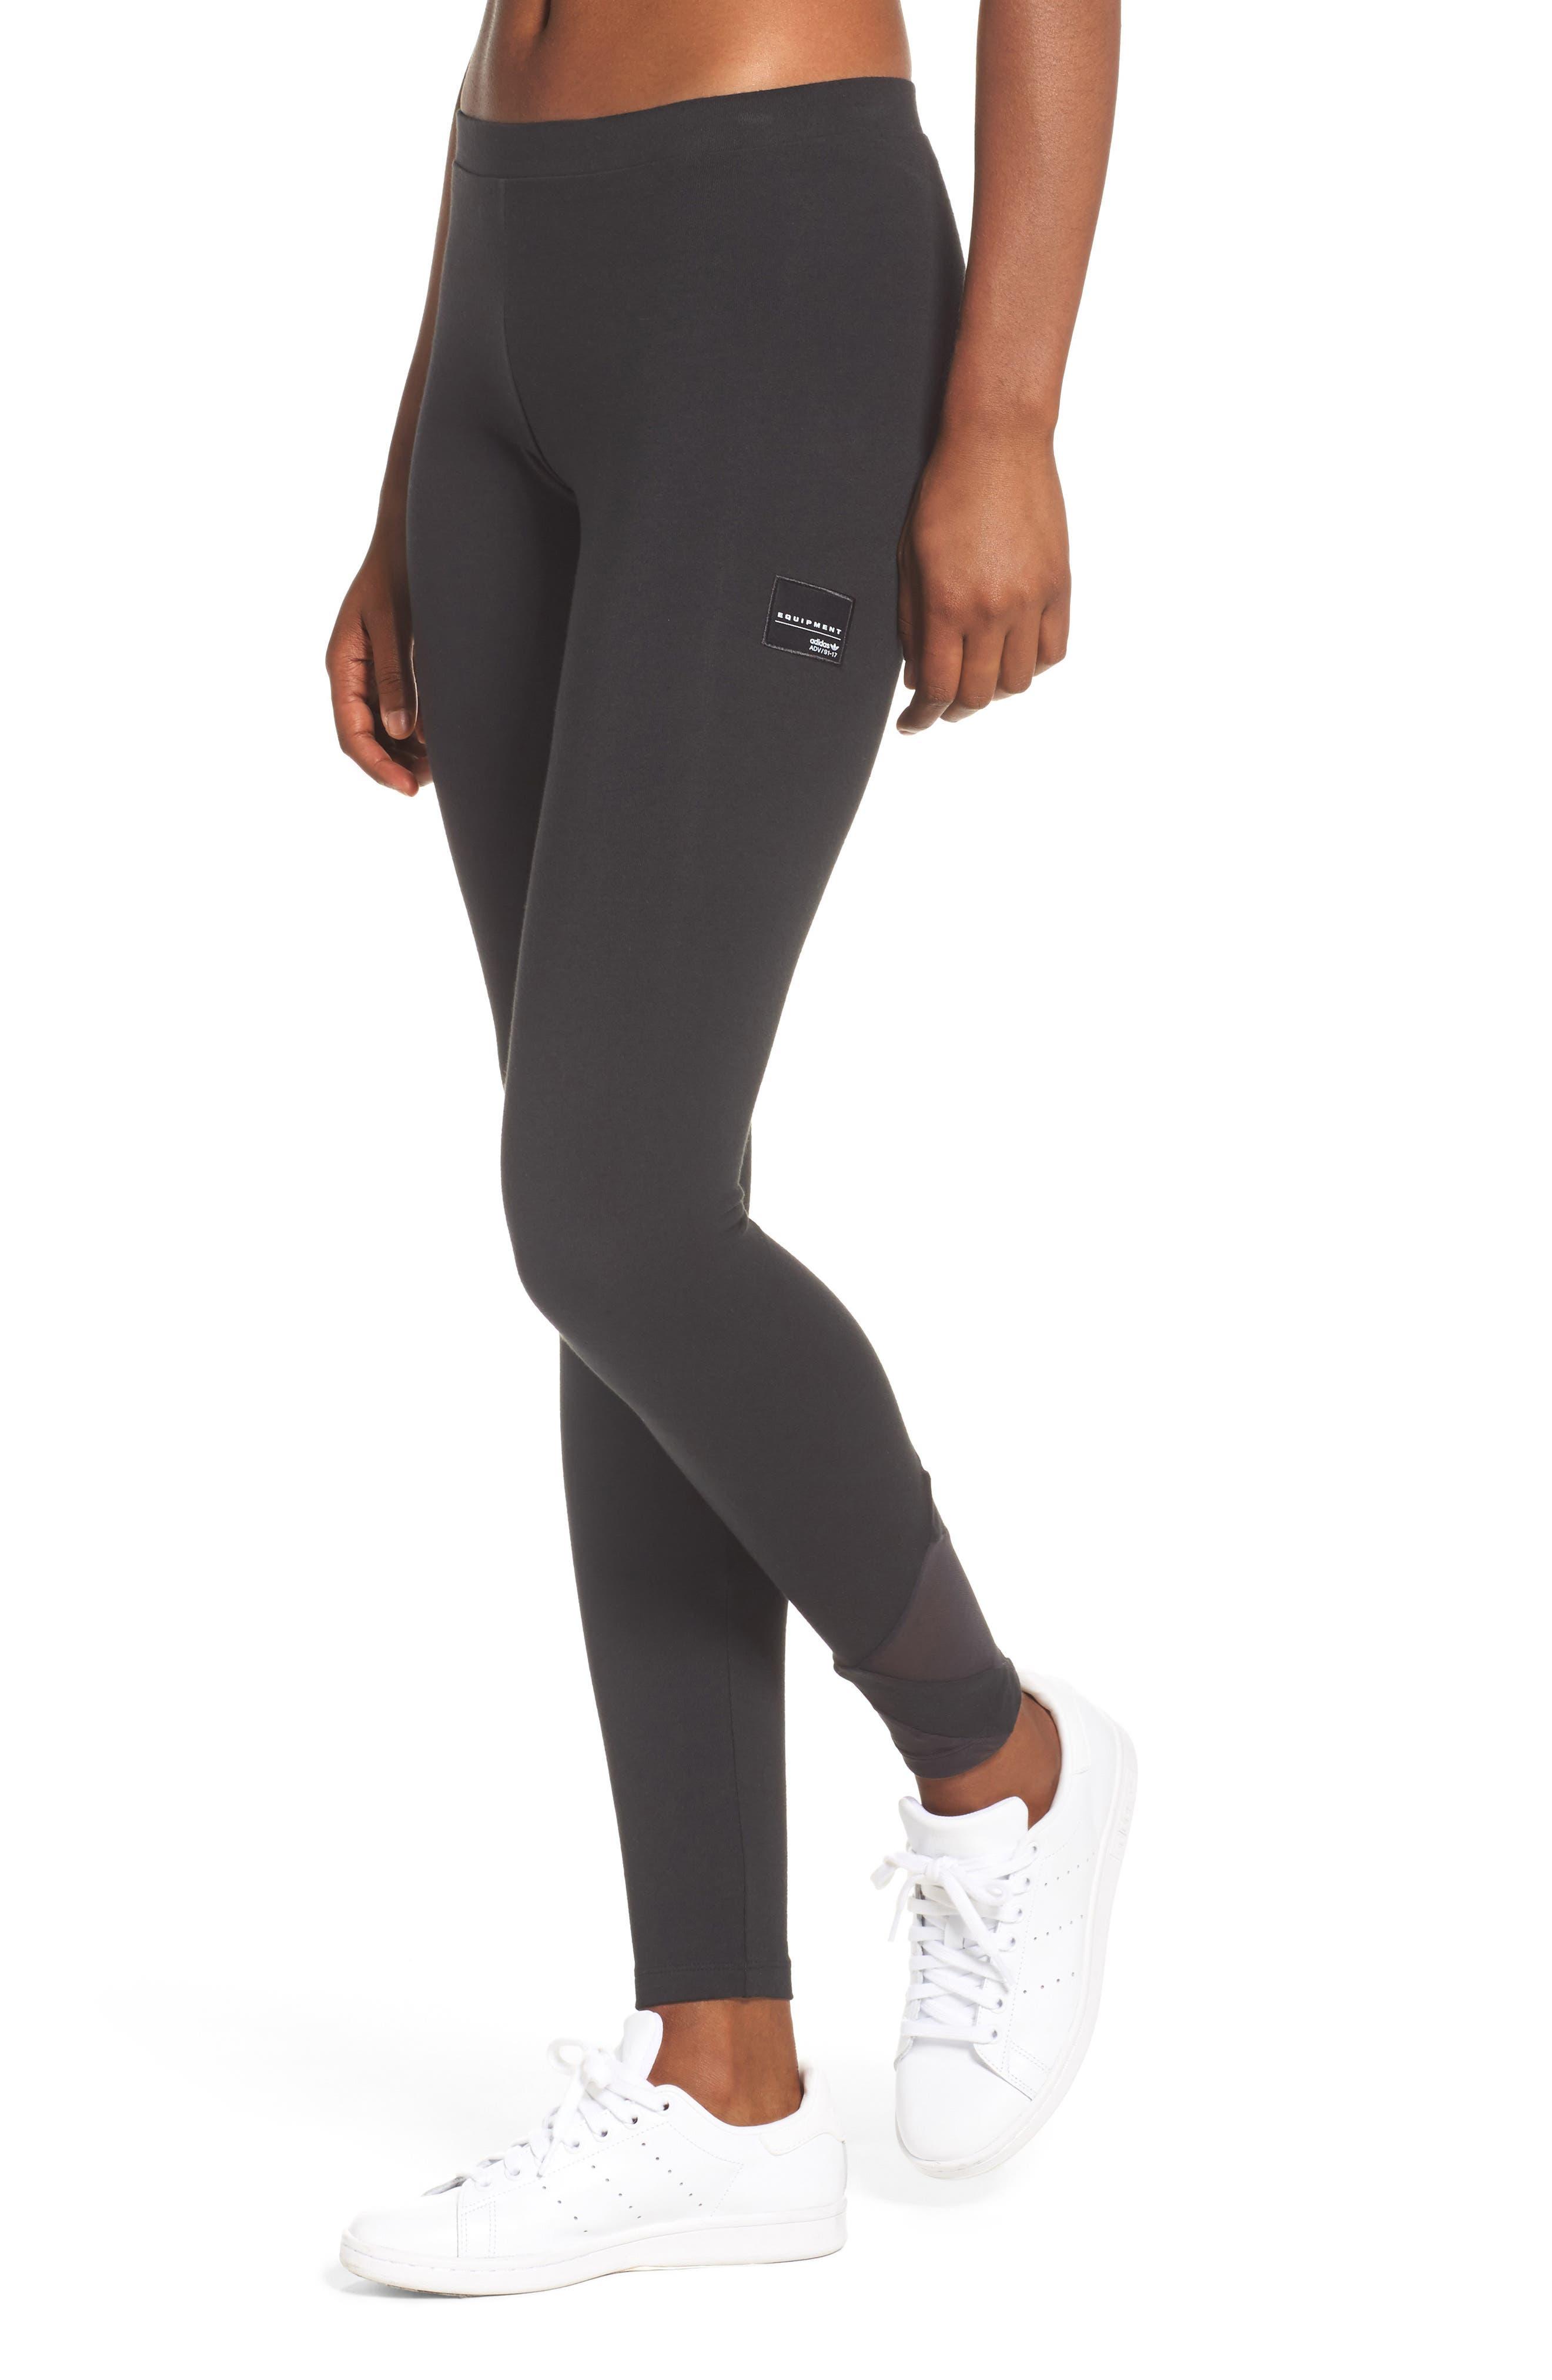 adidas Originals EQT Asymmetrical Leggings